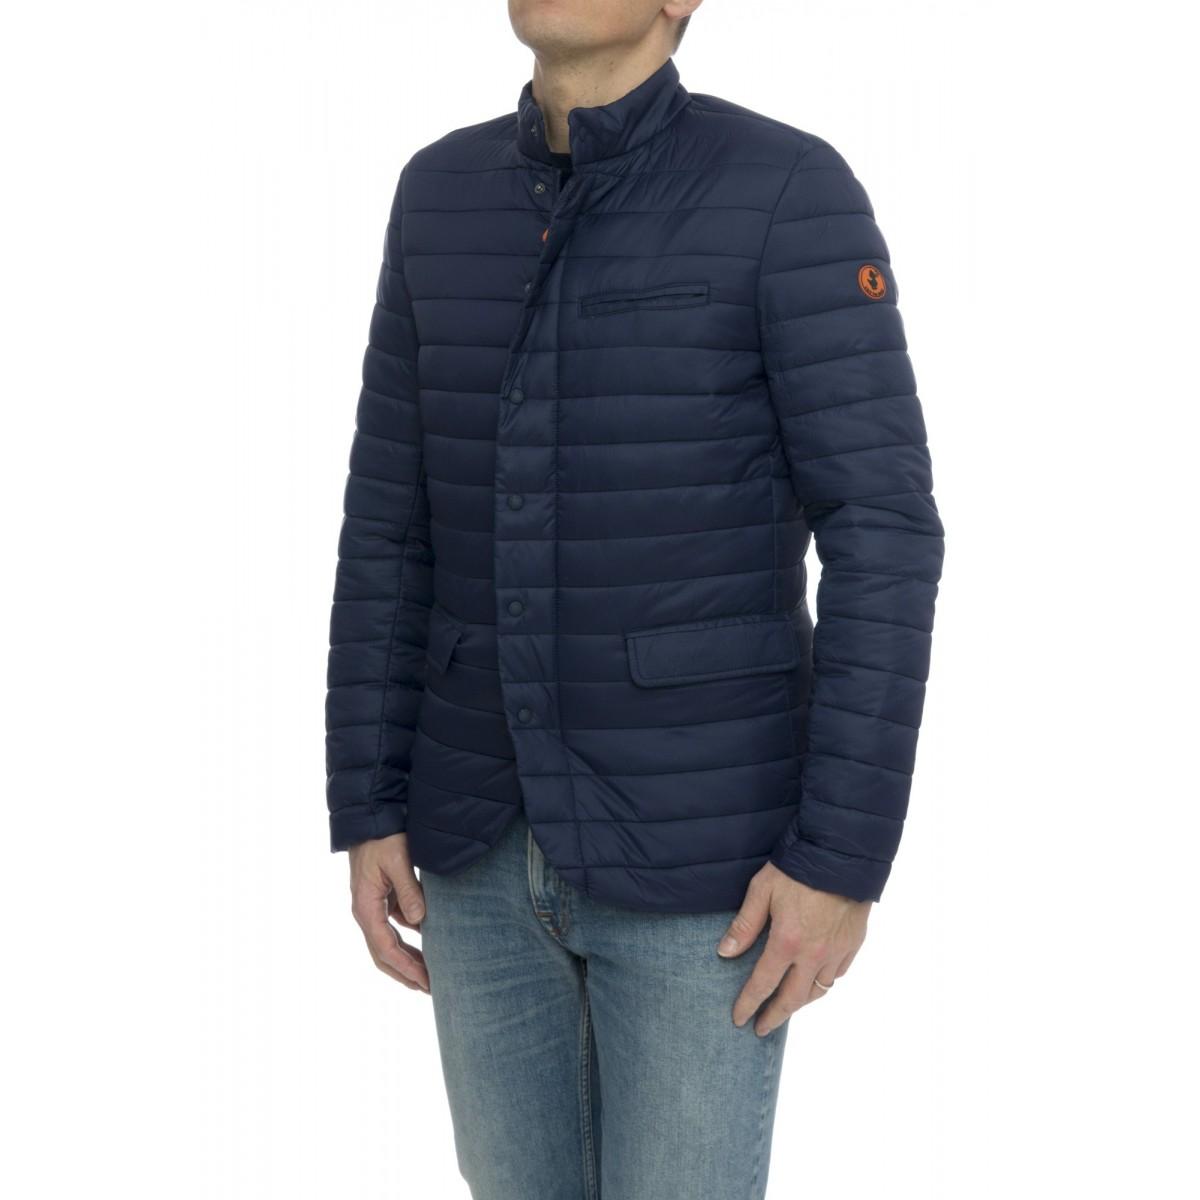 Giubbini - D3598m giga4 giacca con bottoni e zip